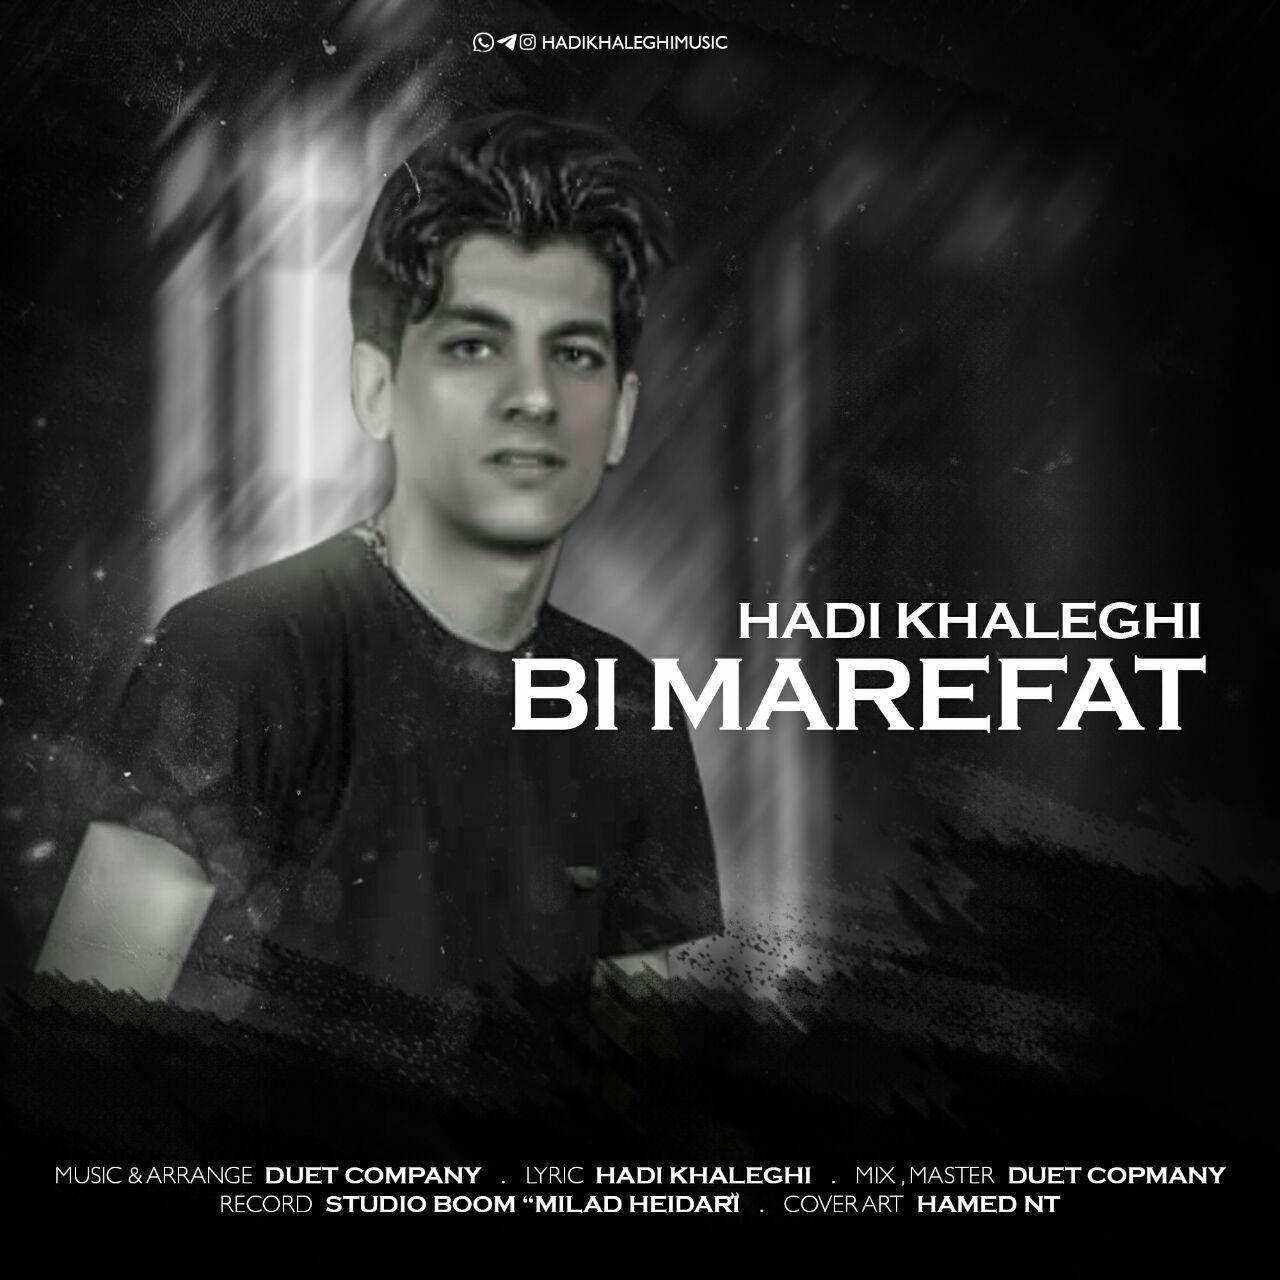 http://s6.picofile.com/file/8388860492/12Hadi_Khaleghi_Bi_Marefat.jpg